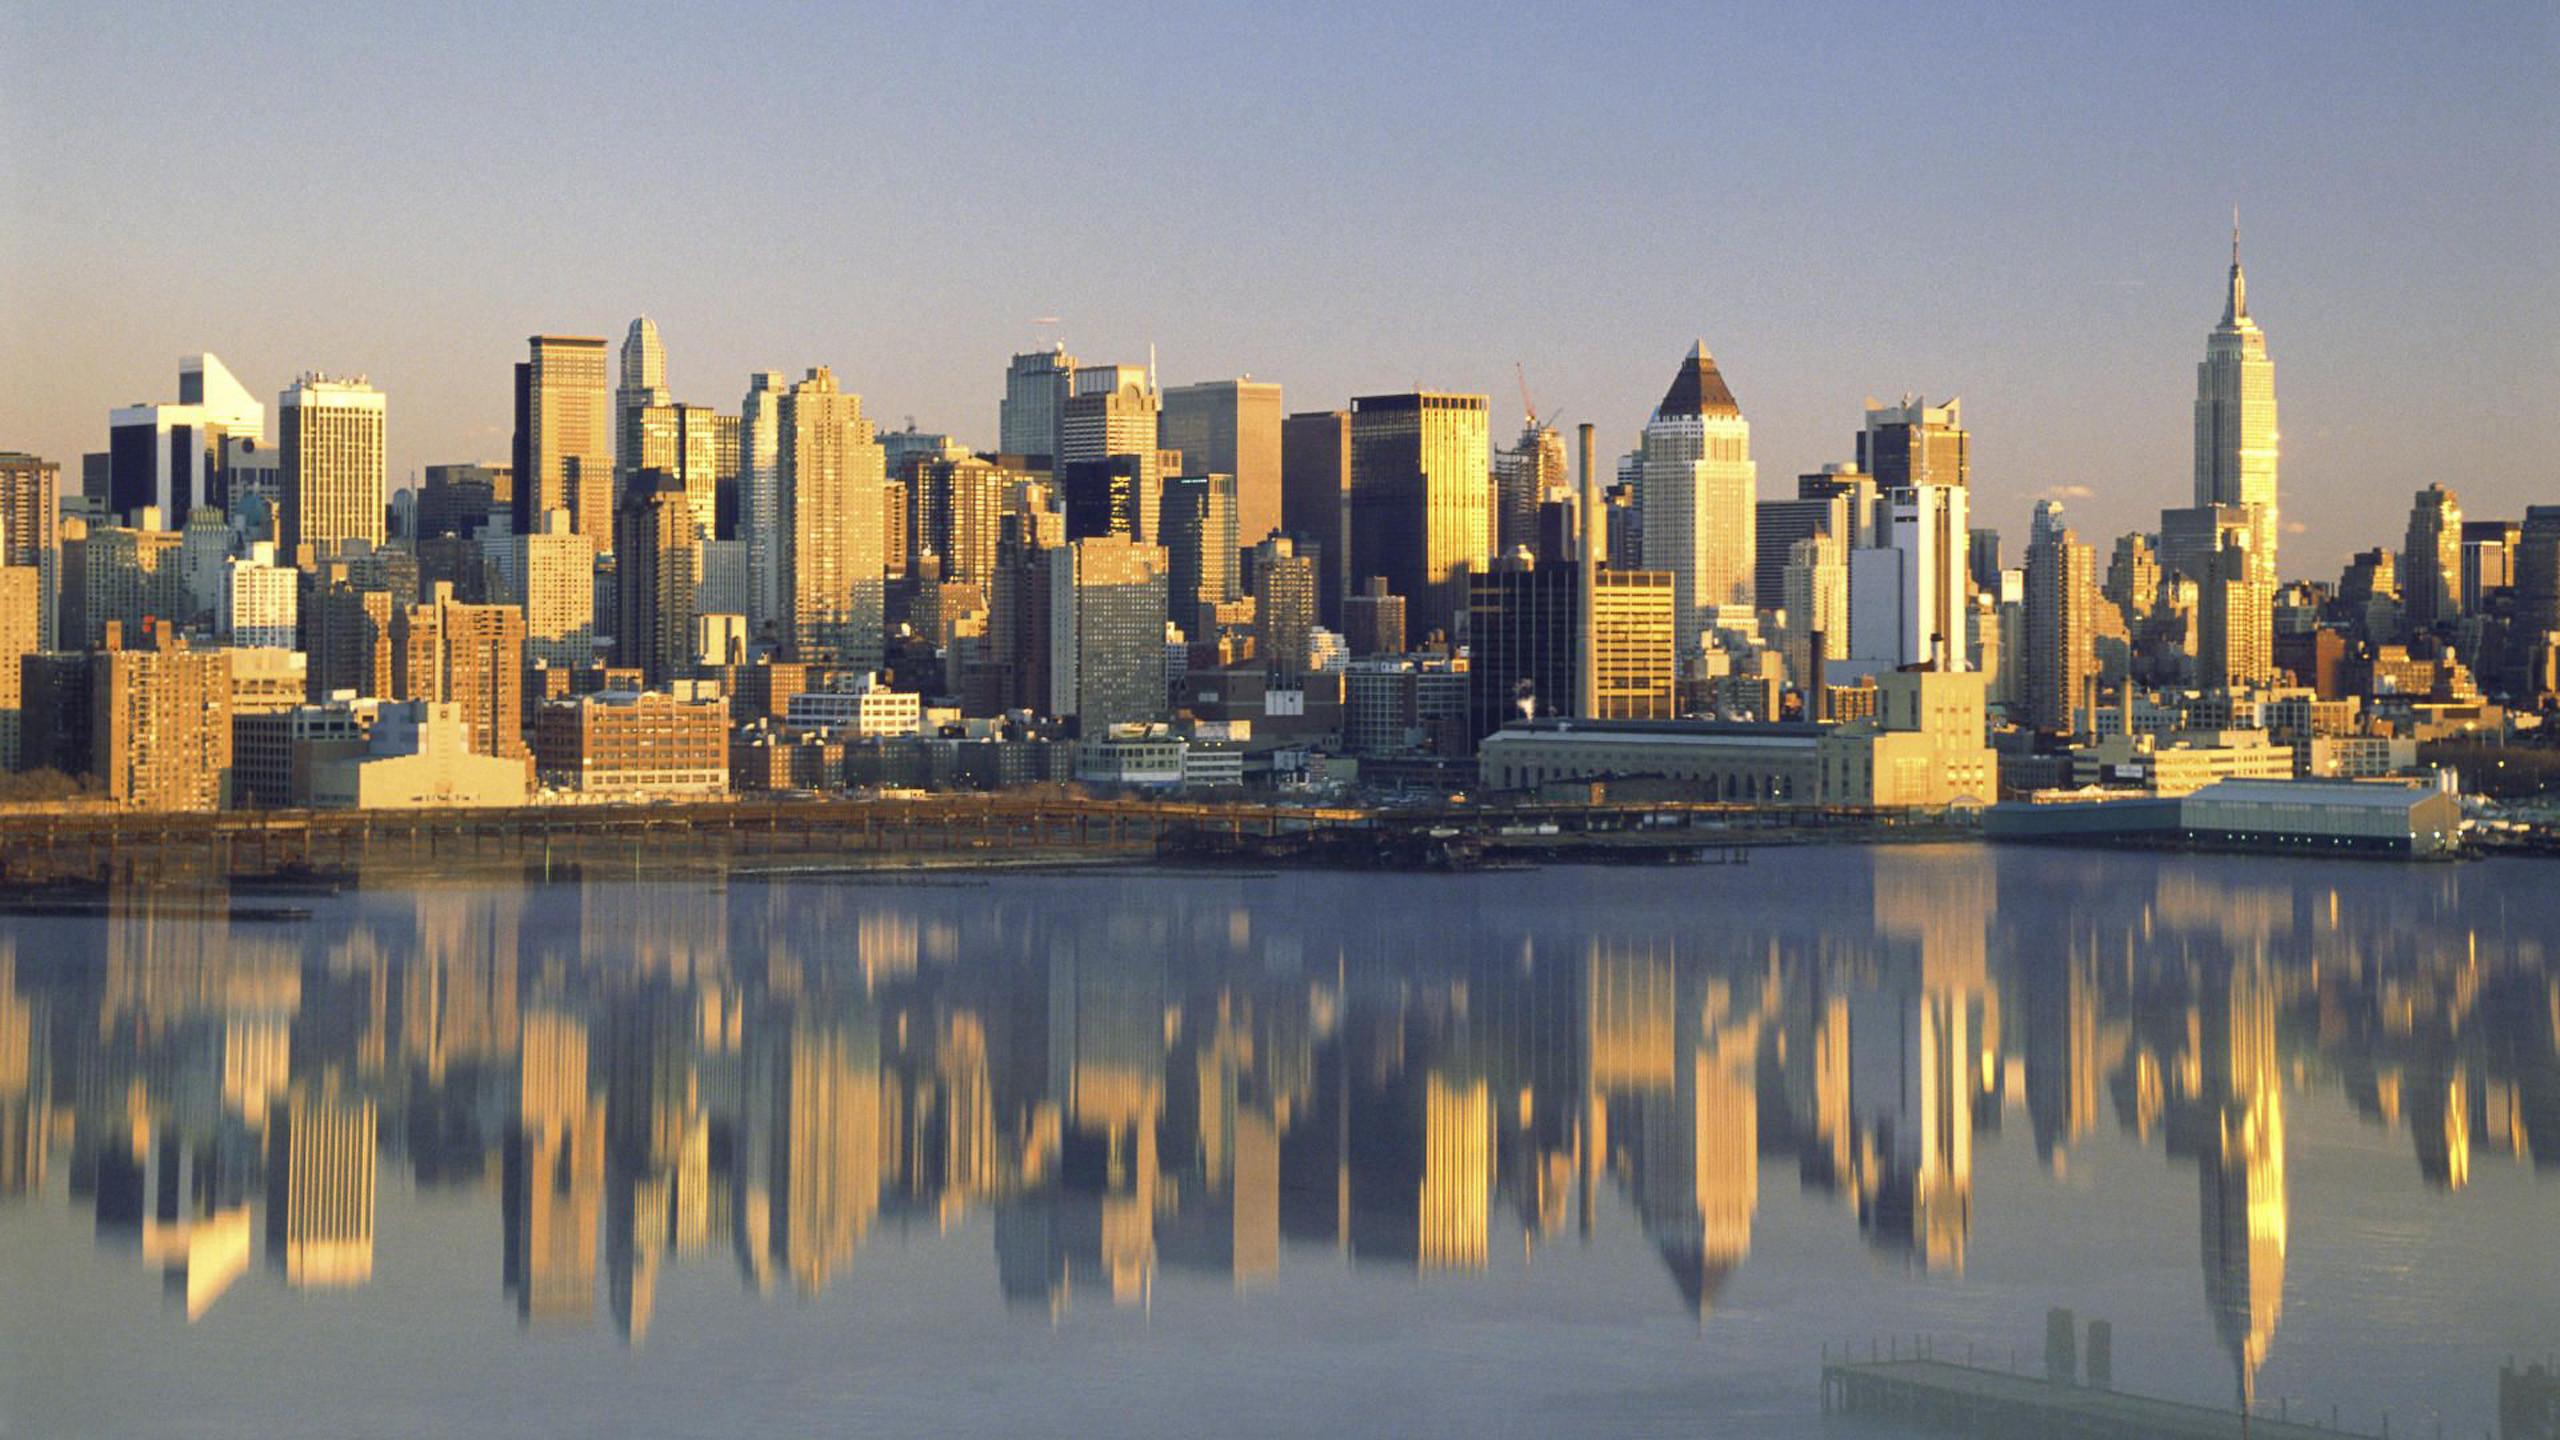 Skyline New York City wallpaper wallpaper free download 1920×1080 New York Skyline  Wallpaper (